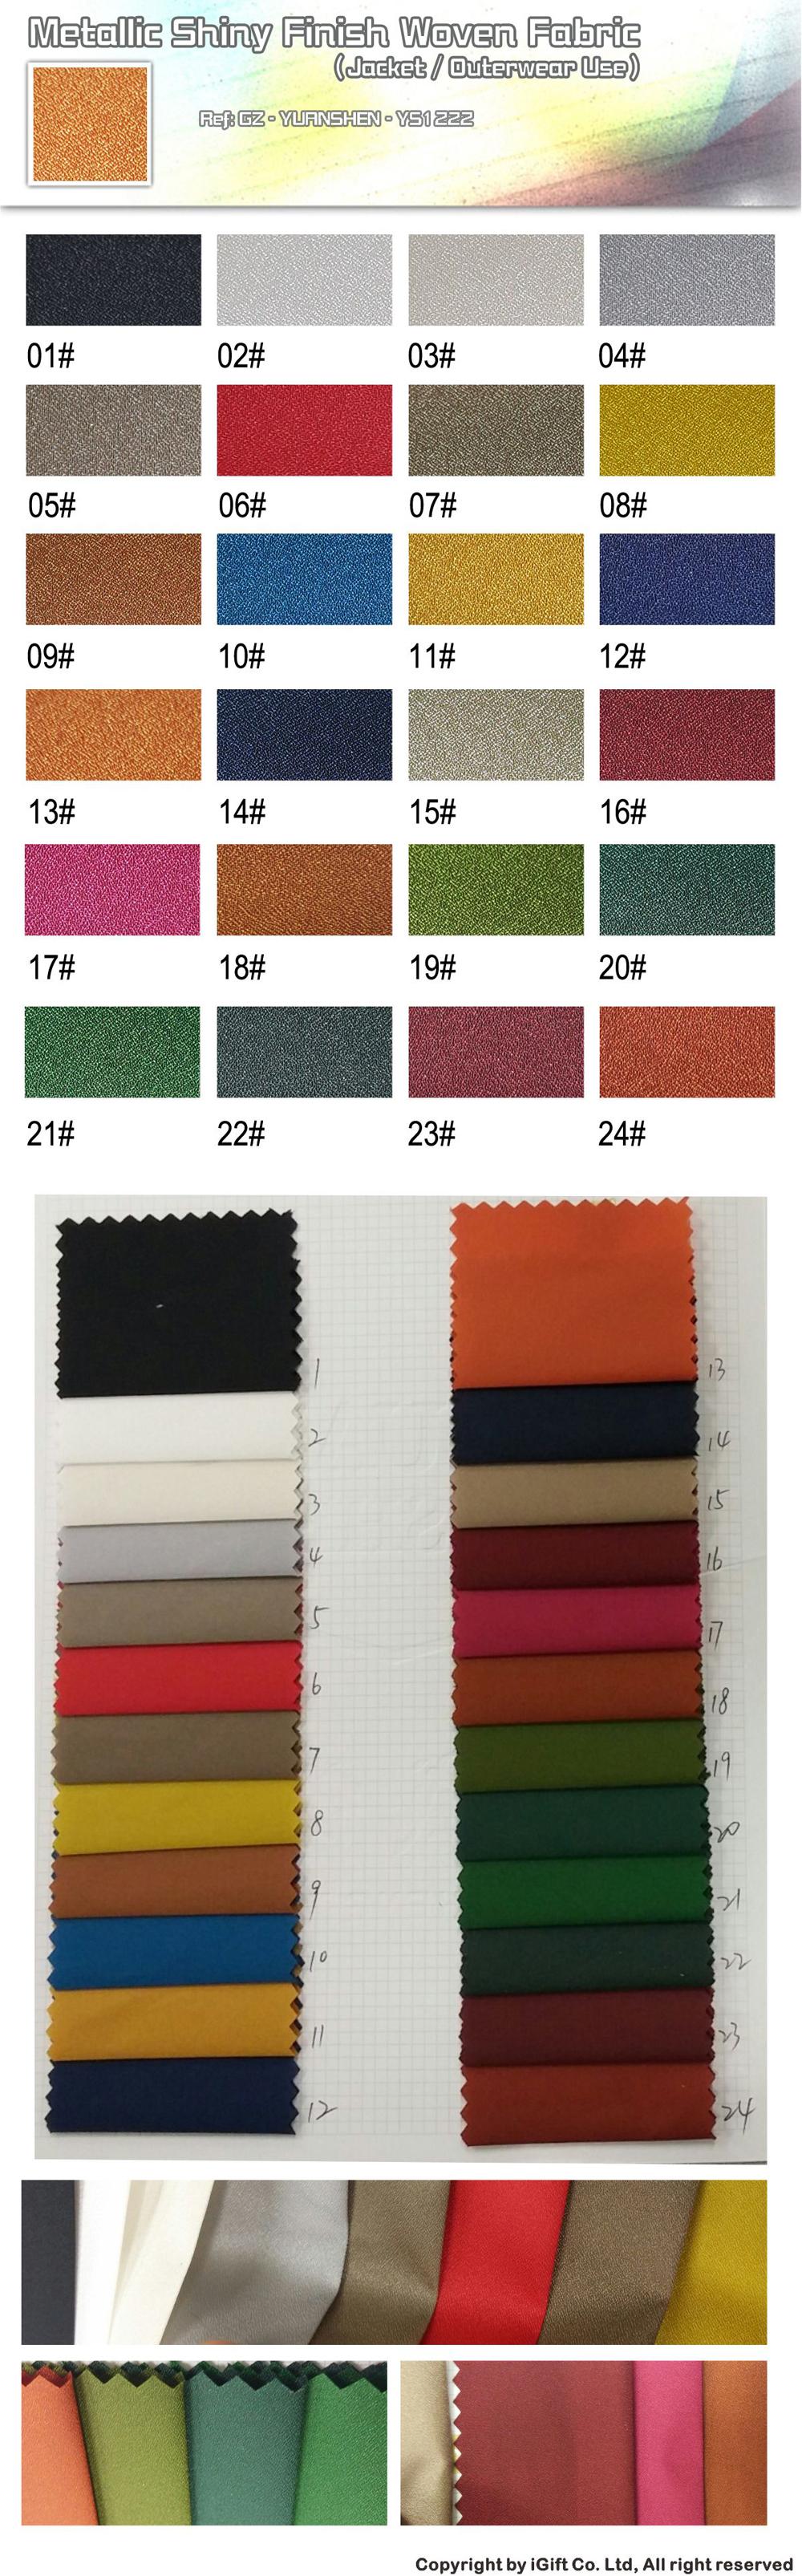 MetallicShiny Finish Woven Fabric YS1222